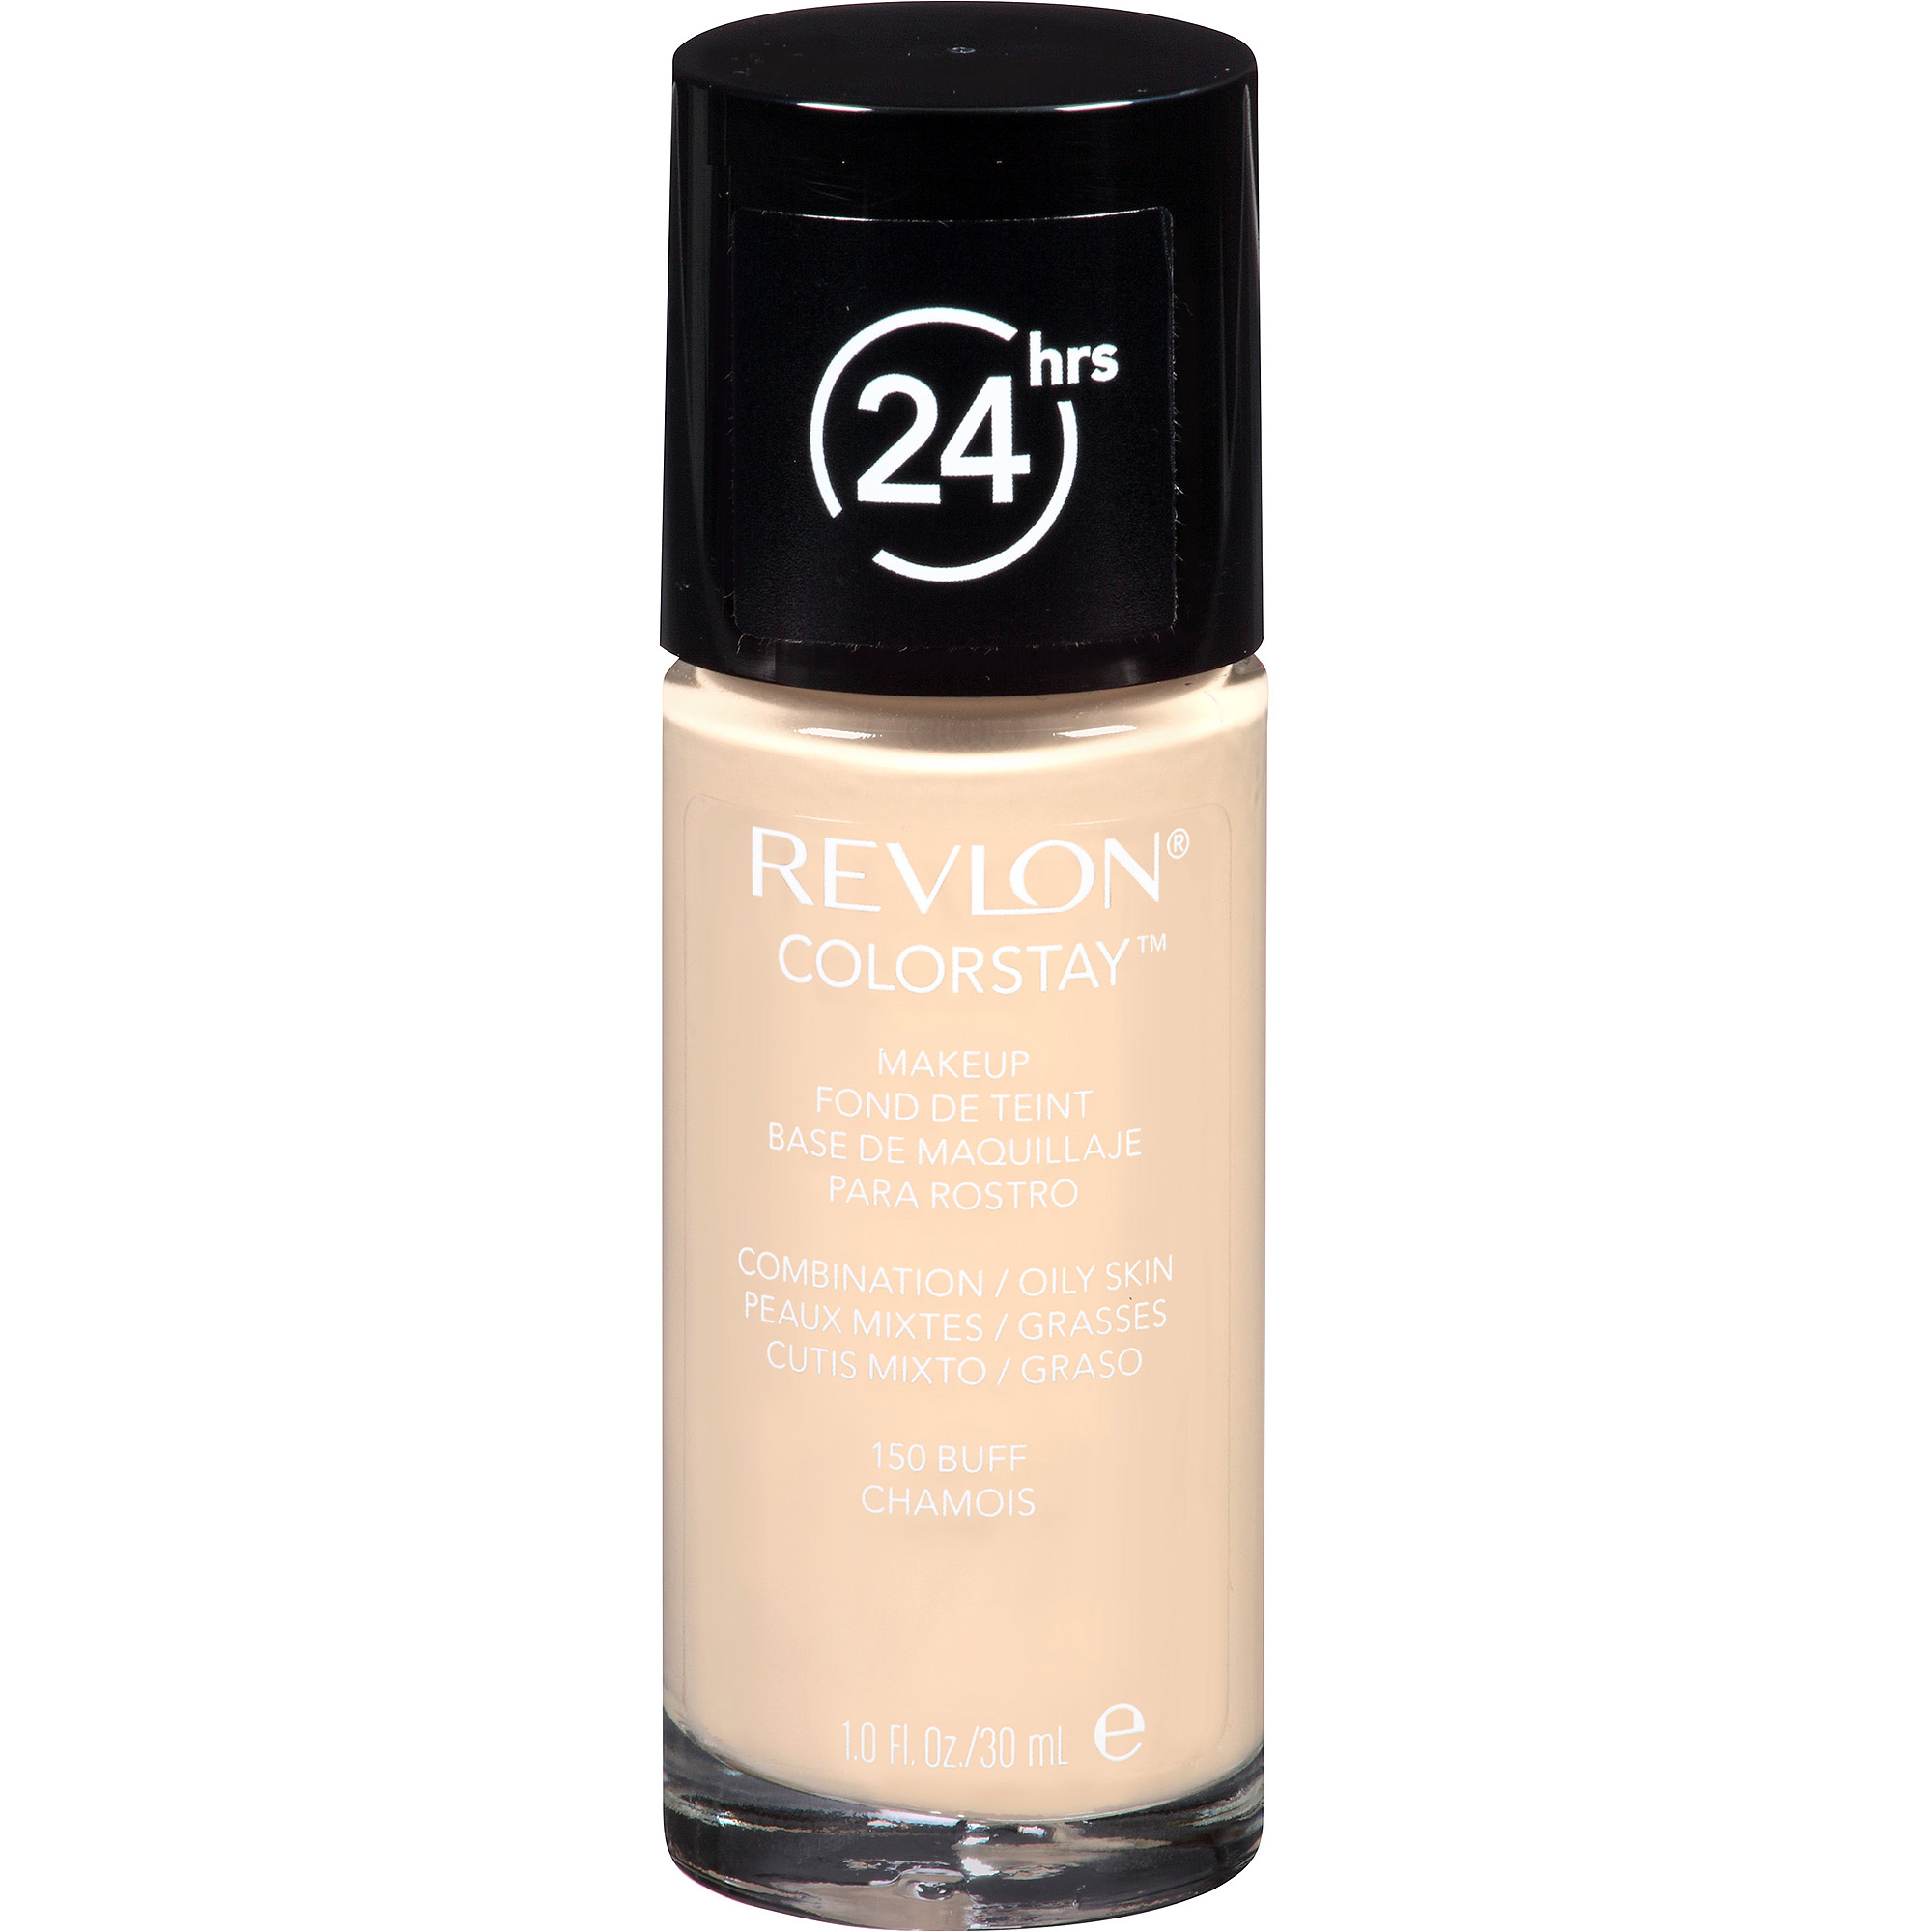 Revlon ColorStay Makeup for Combination/Oily Skin, 150 Buff, 1 fl oz